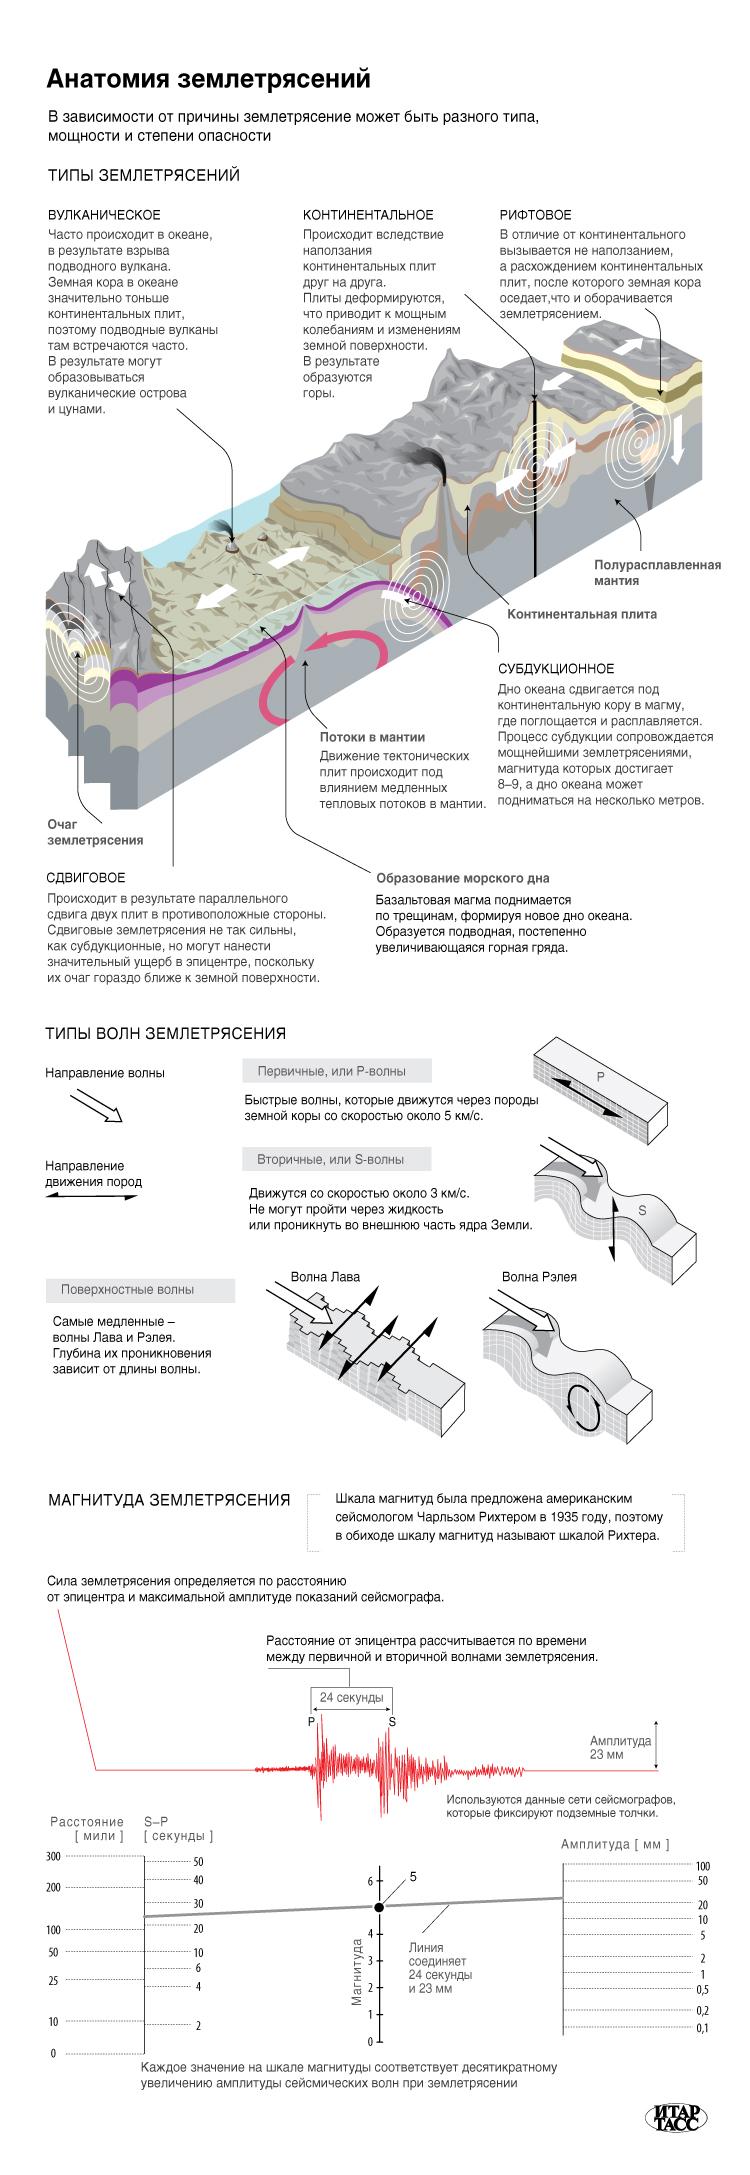 Анатомия землетрясений